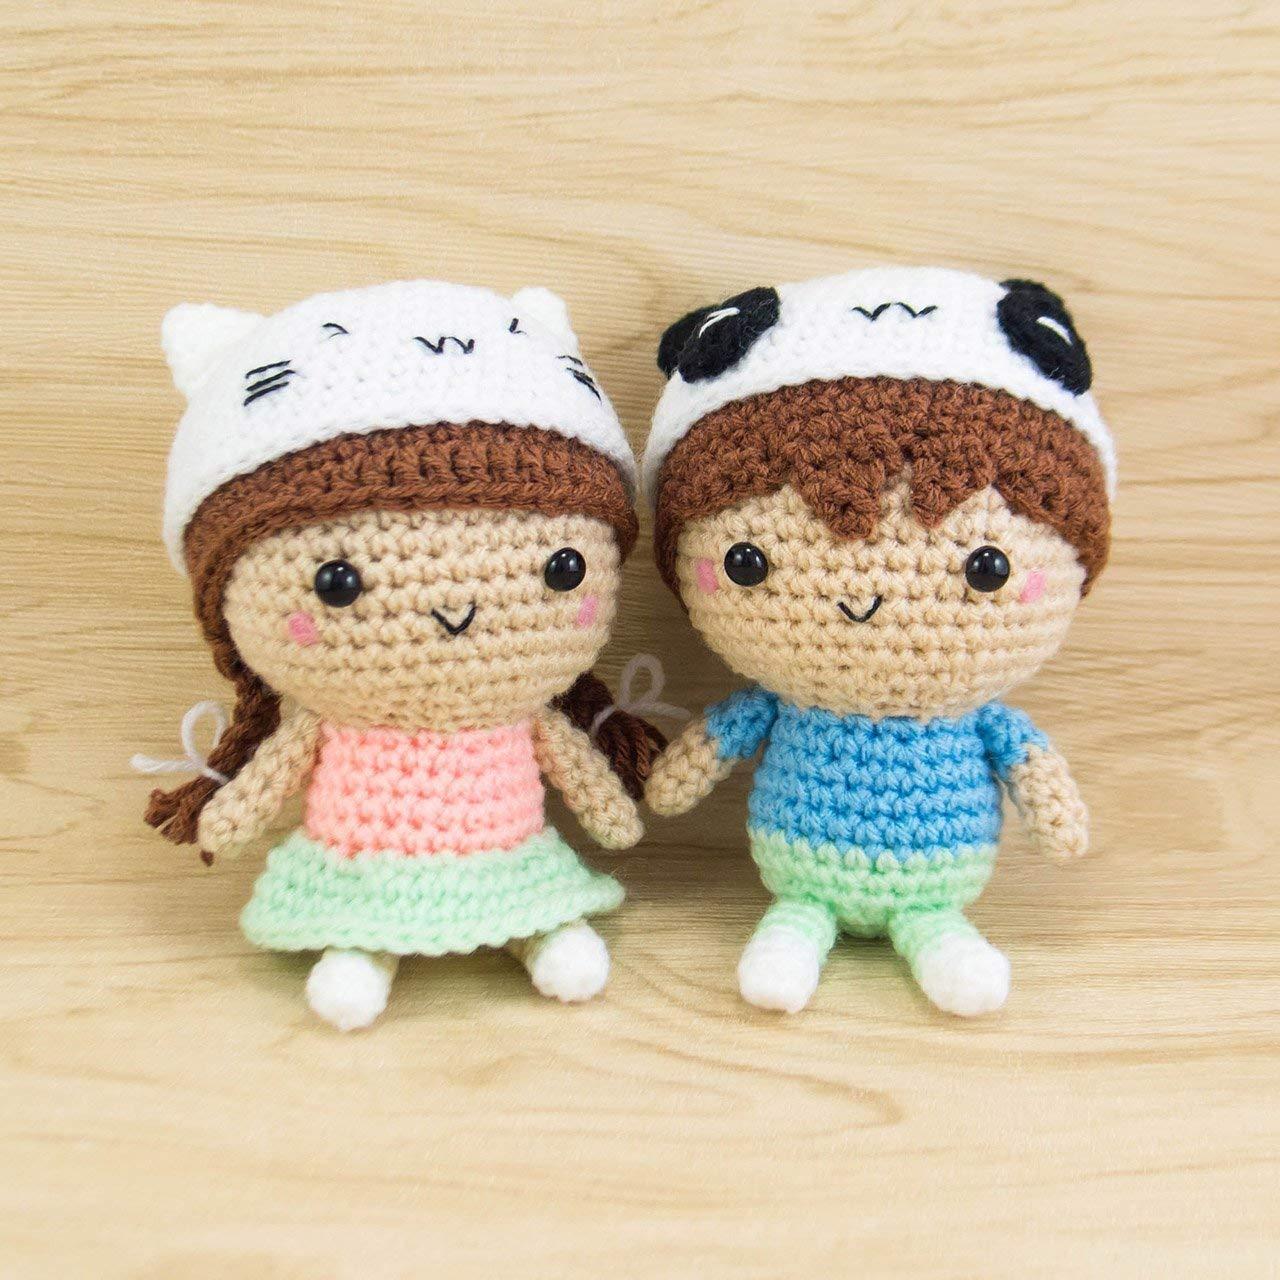 Amigurumi pattern for crochet chinchilla. Crochet cat toy pattern | 1280x1280